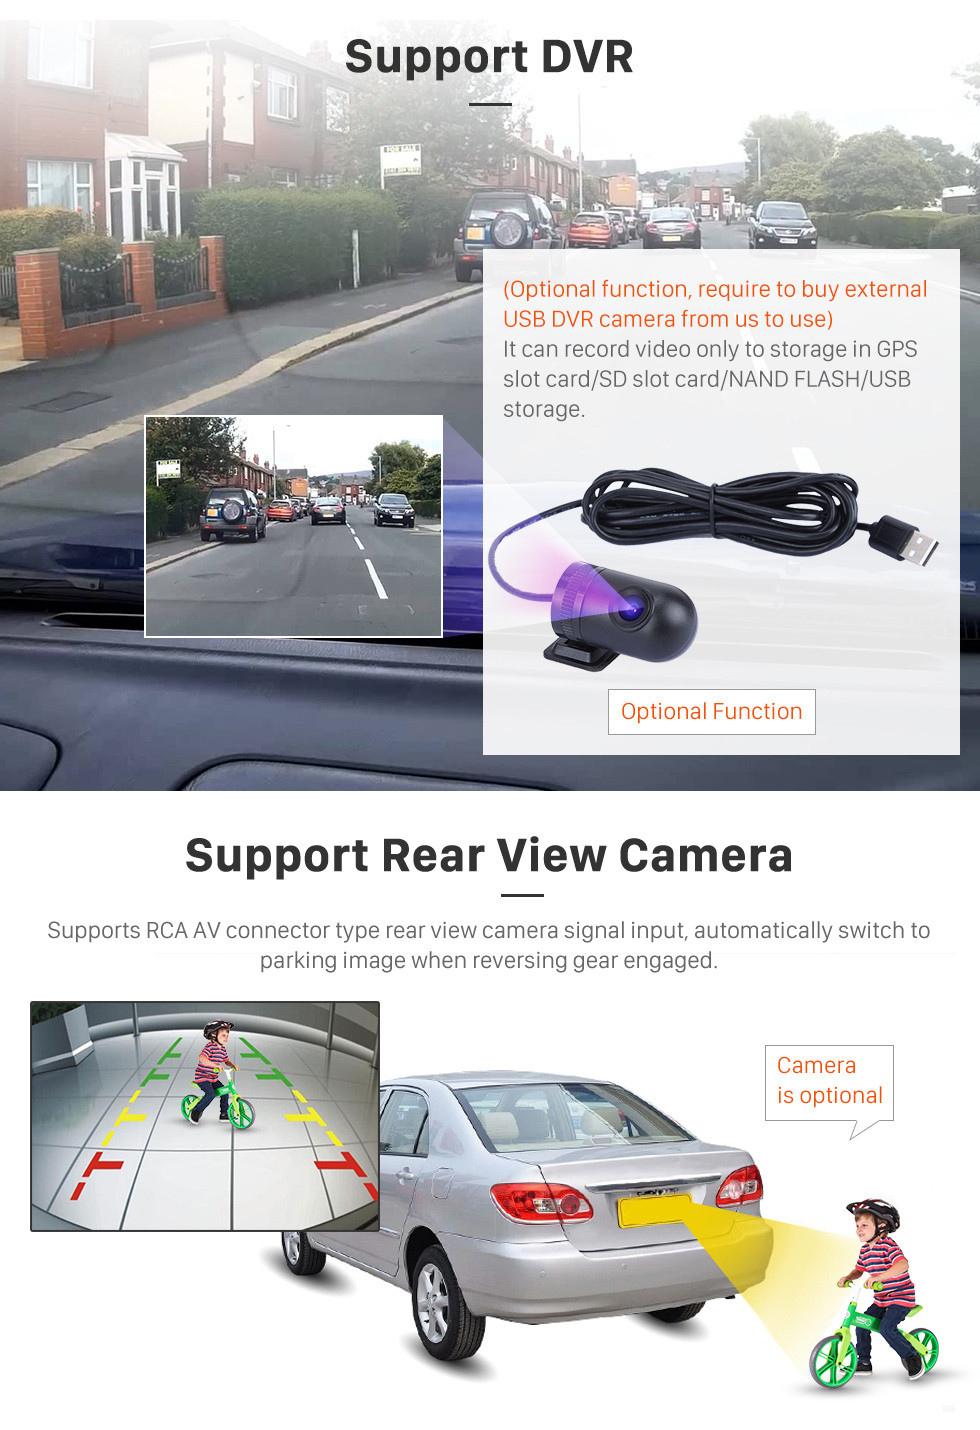 Seicane 9 inch Android 10.0 For 2016-2017 Kia KX5 Radio GPS Navigation System Touchscreen Wifi Bluetooth Mirror Link OBD2 DAB+ DVR Steering Wheel Control Backup Camera